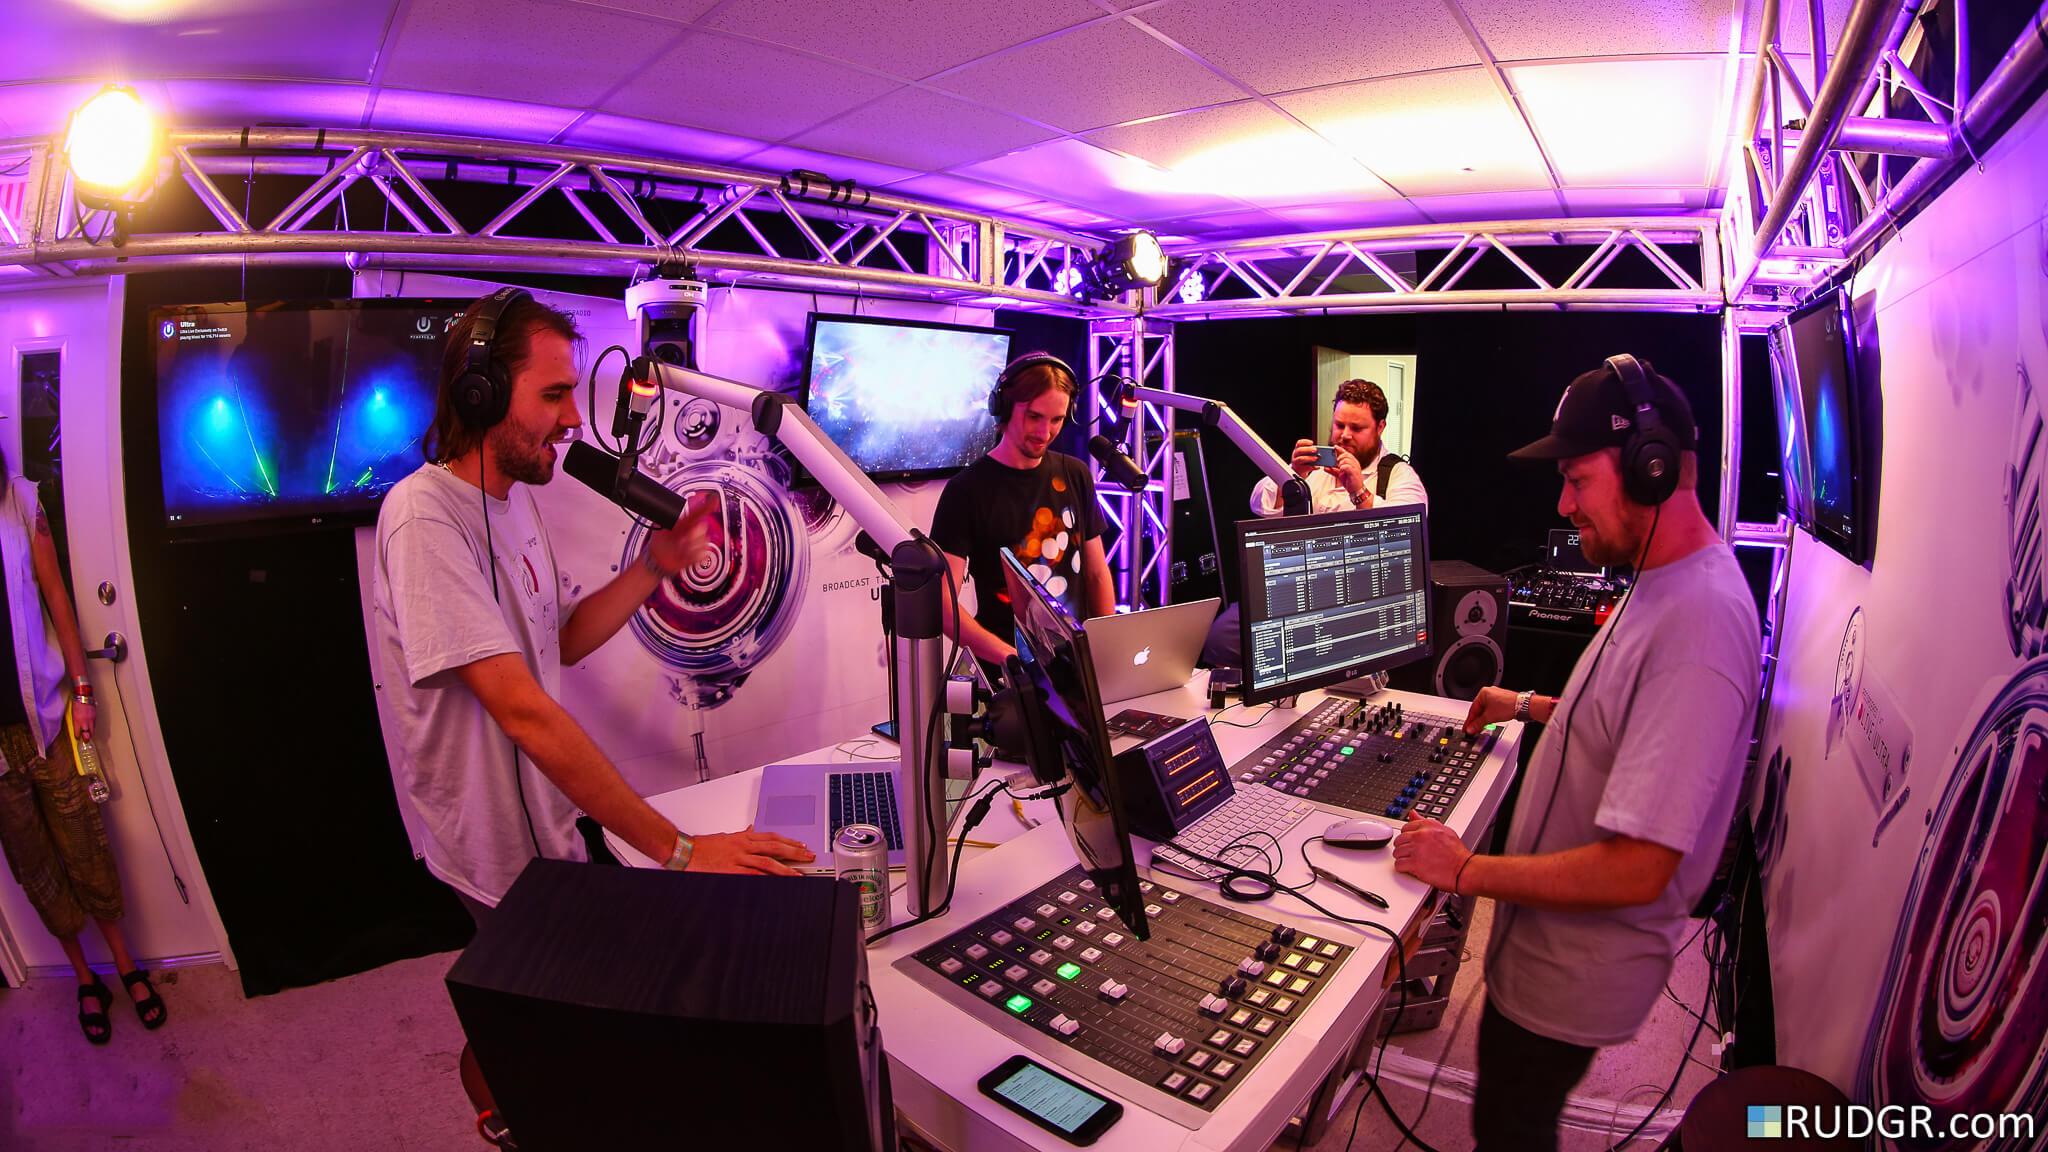 UMF Radio - Ultra Music Festival